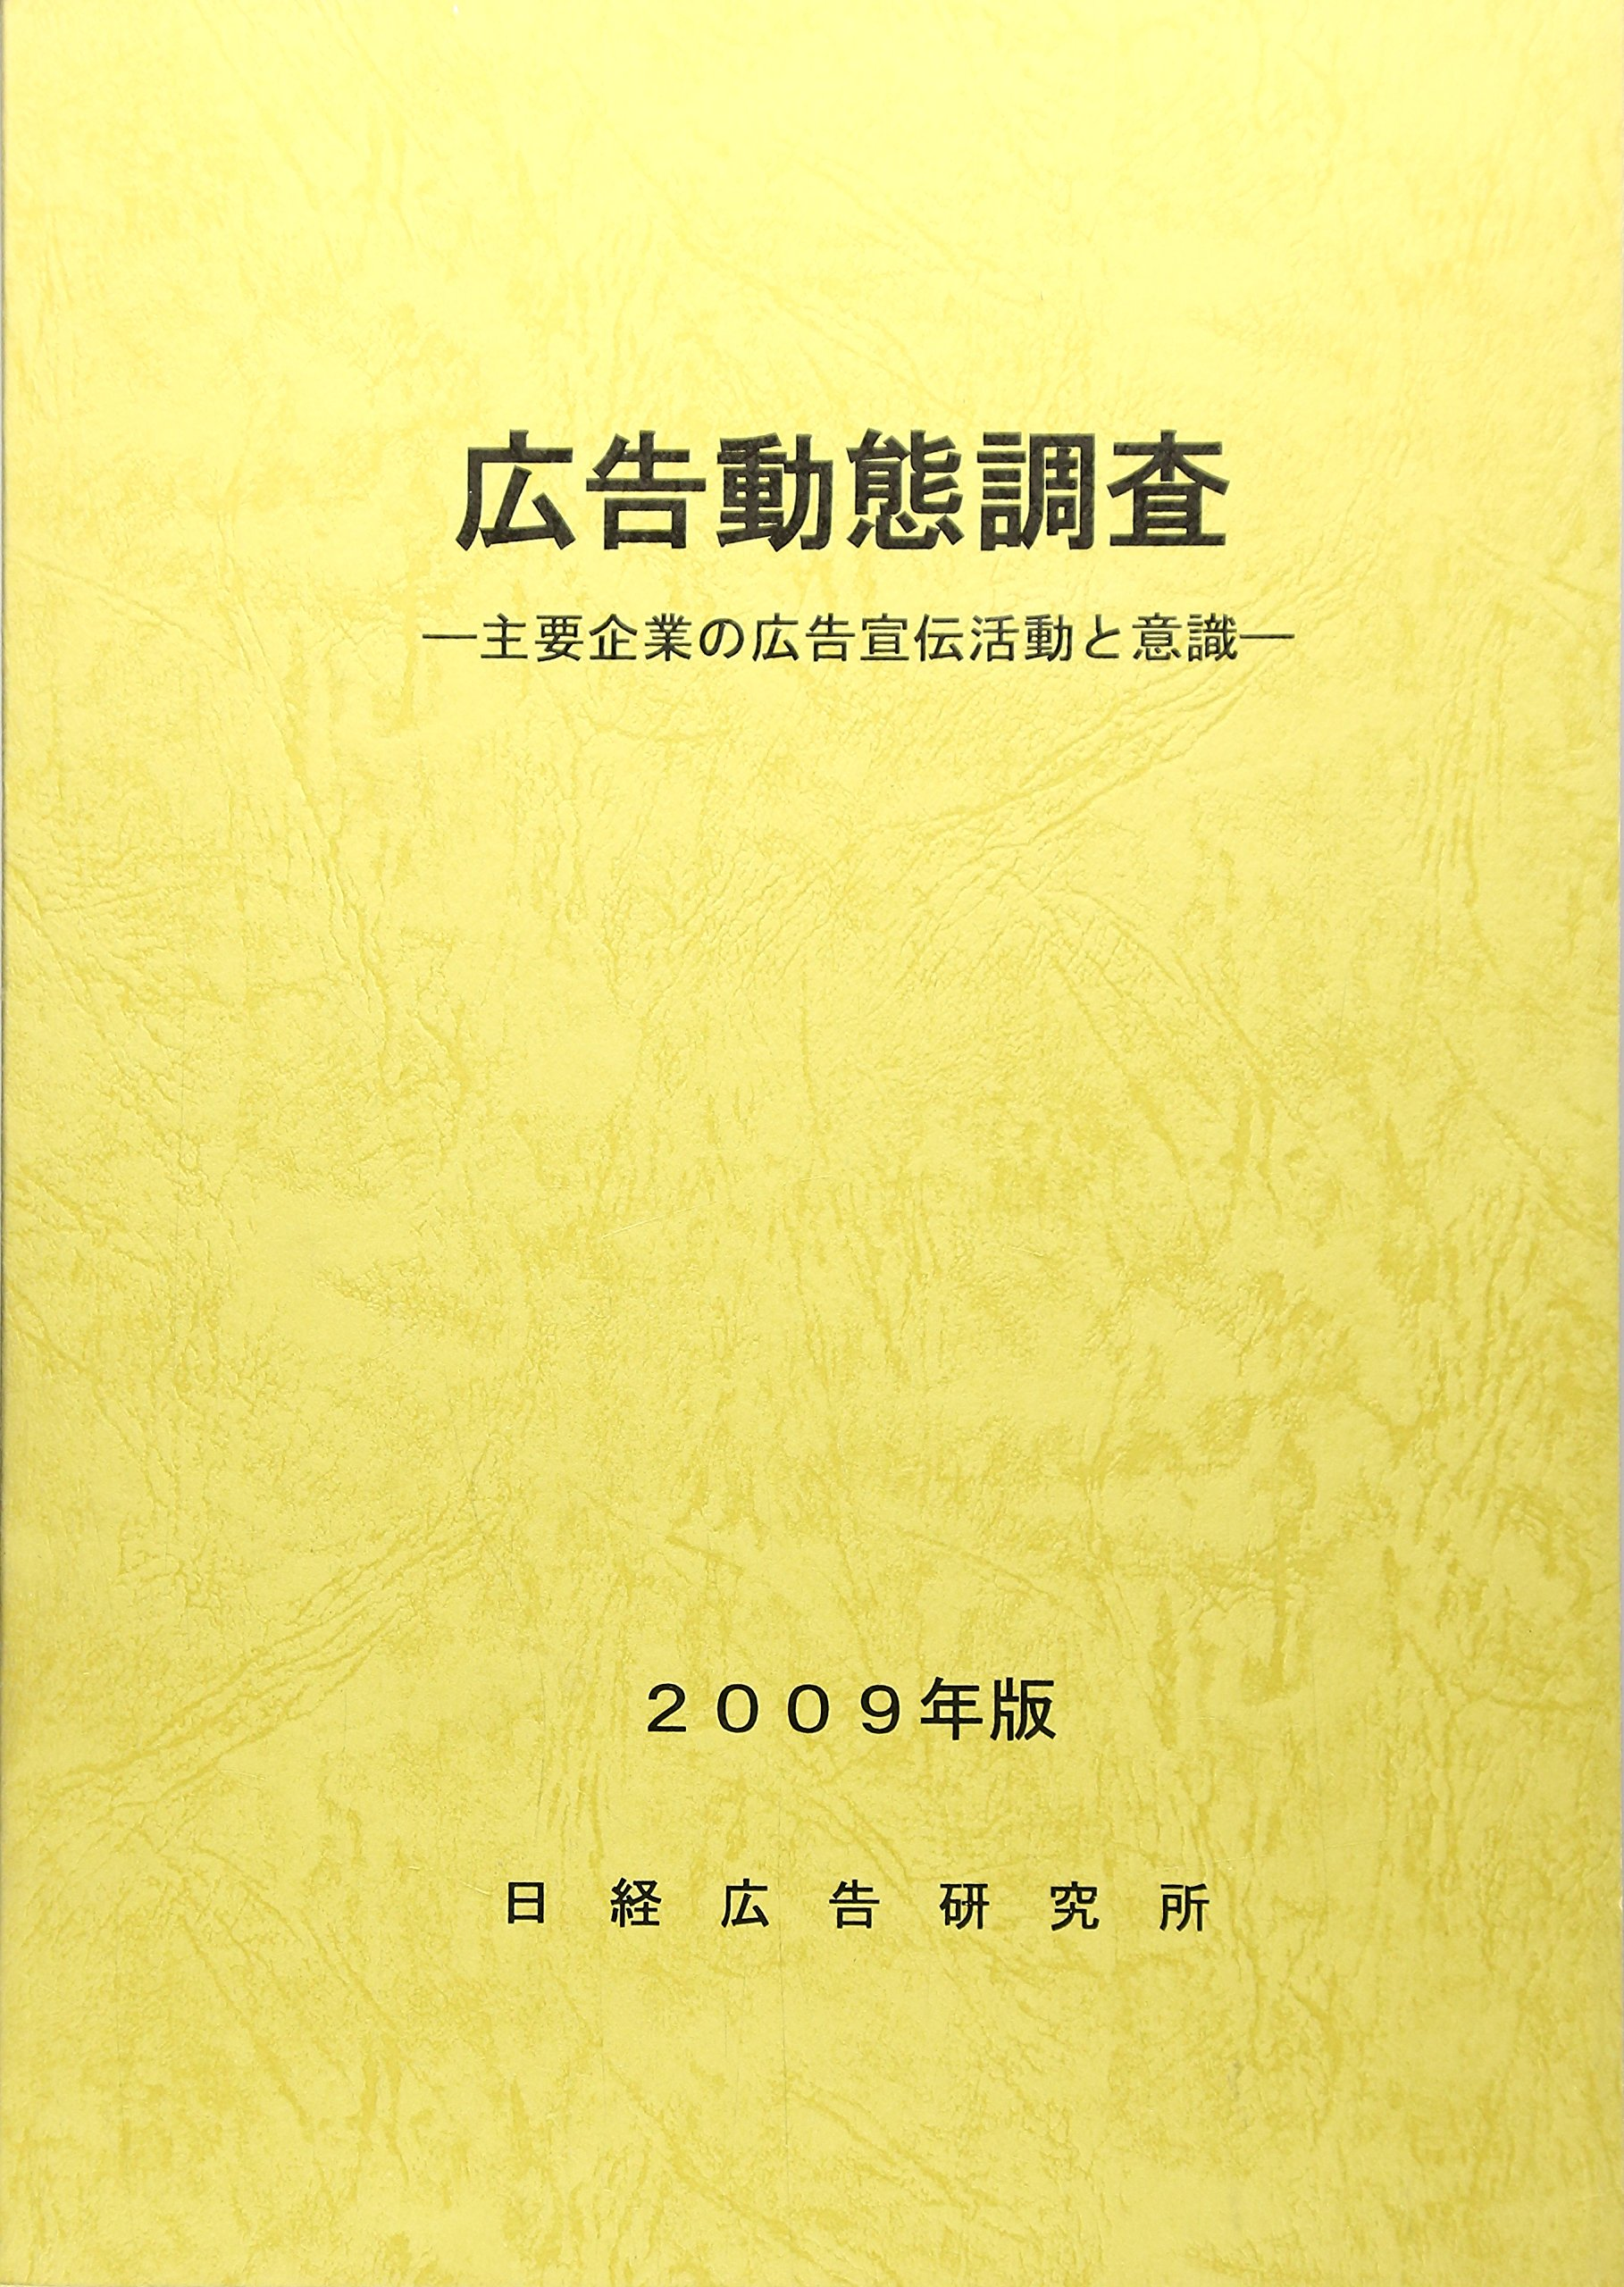 Download Kōkoku dōtai chōsa : shuyō kigyō no kōkoku senden katsudō to ishiki 2009 pdf epub